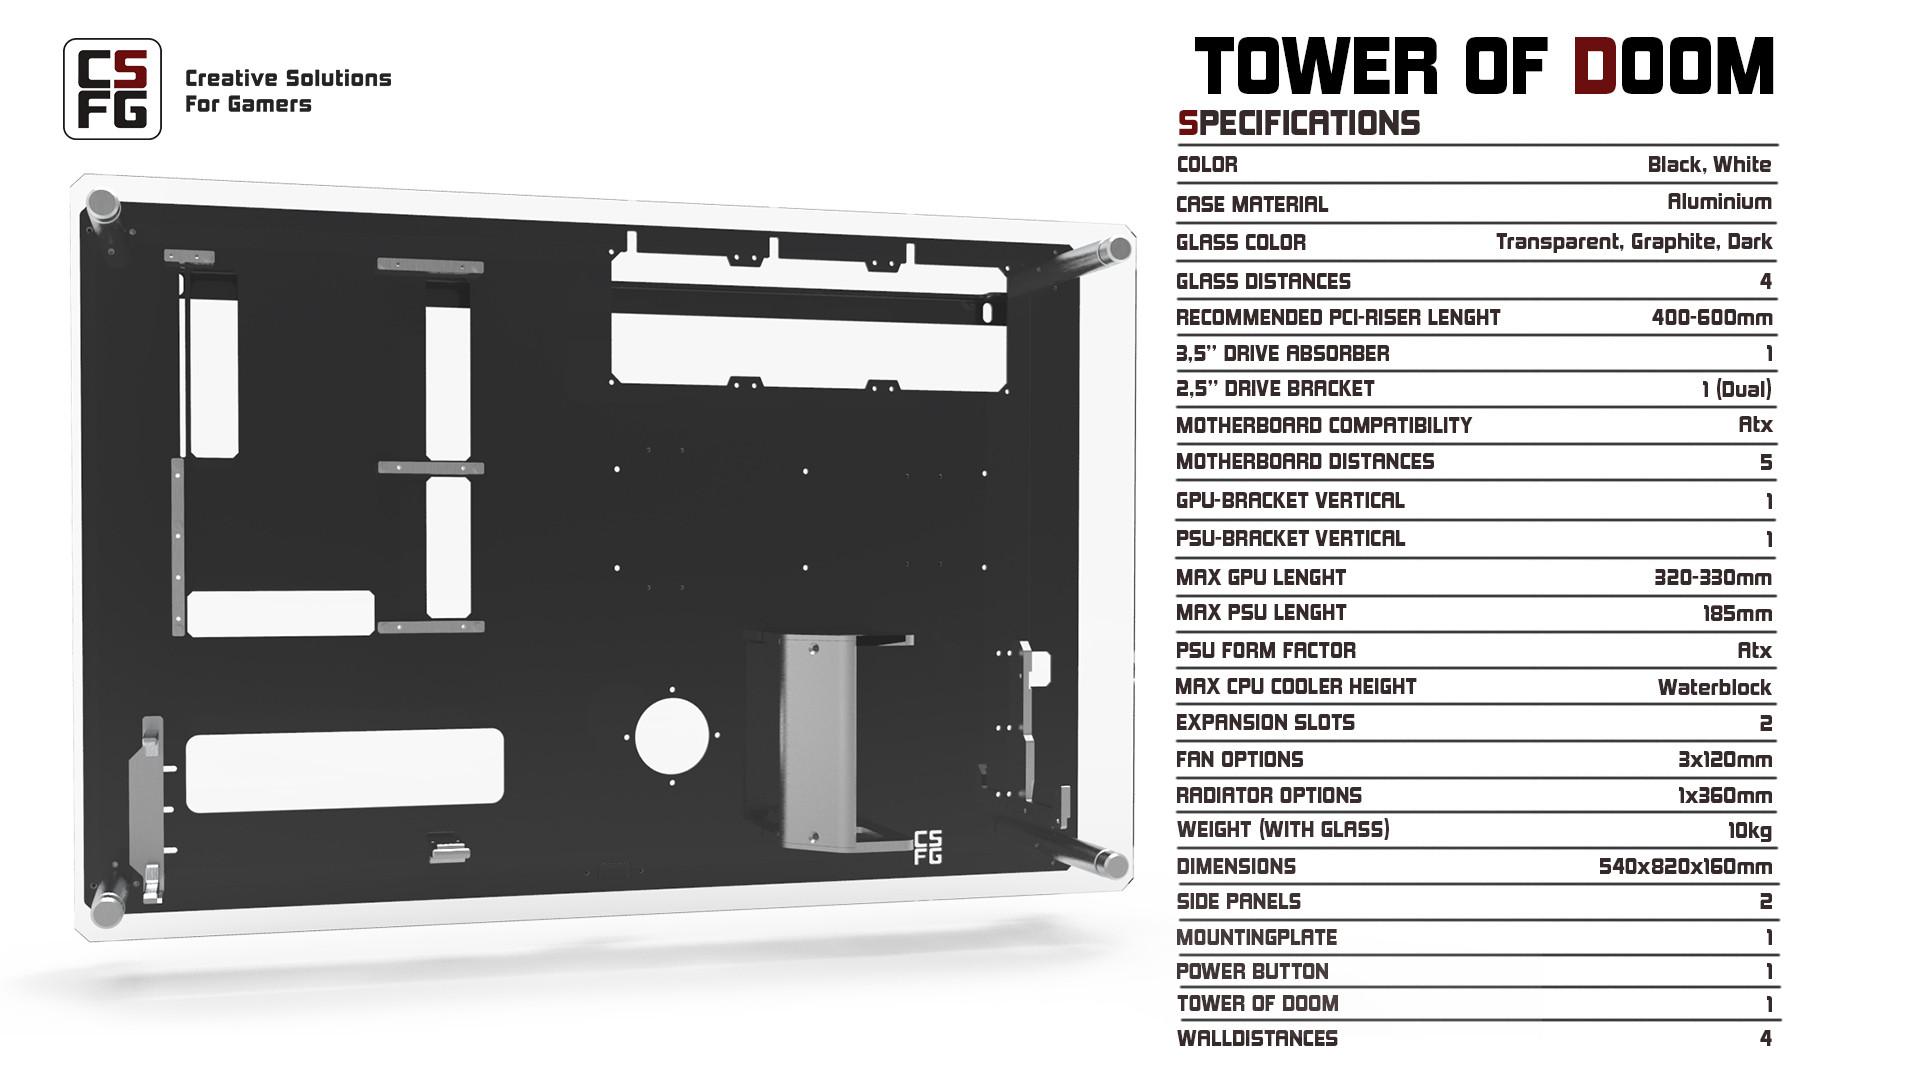 tower_of_doom_specs_new.jpg